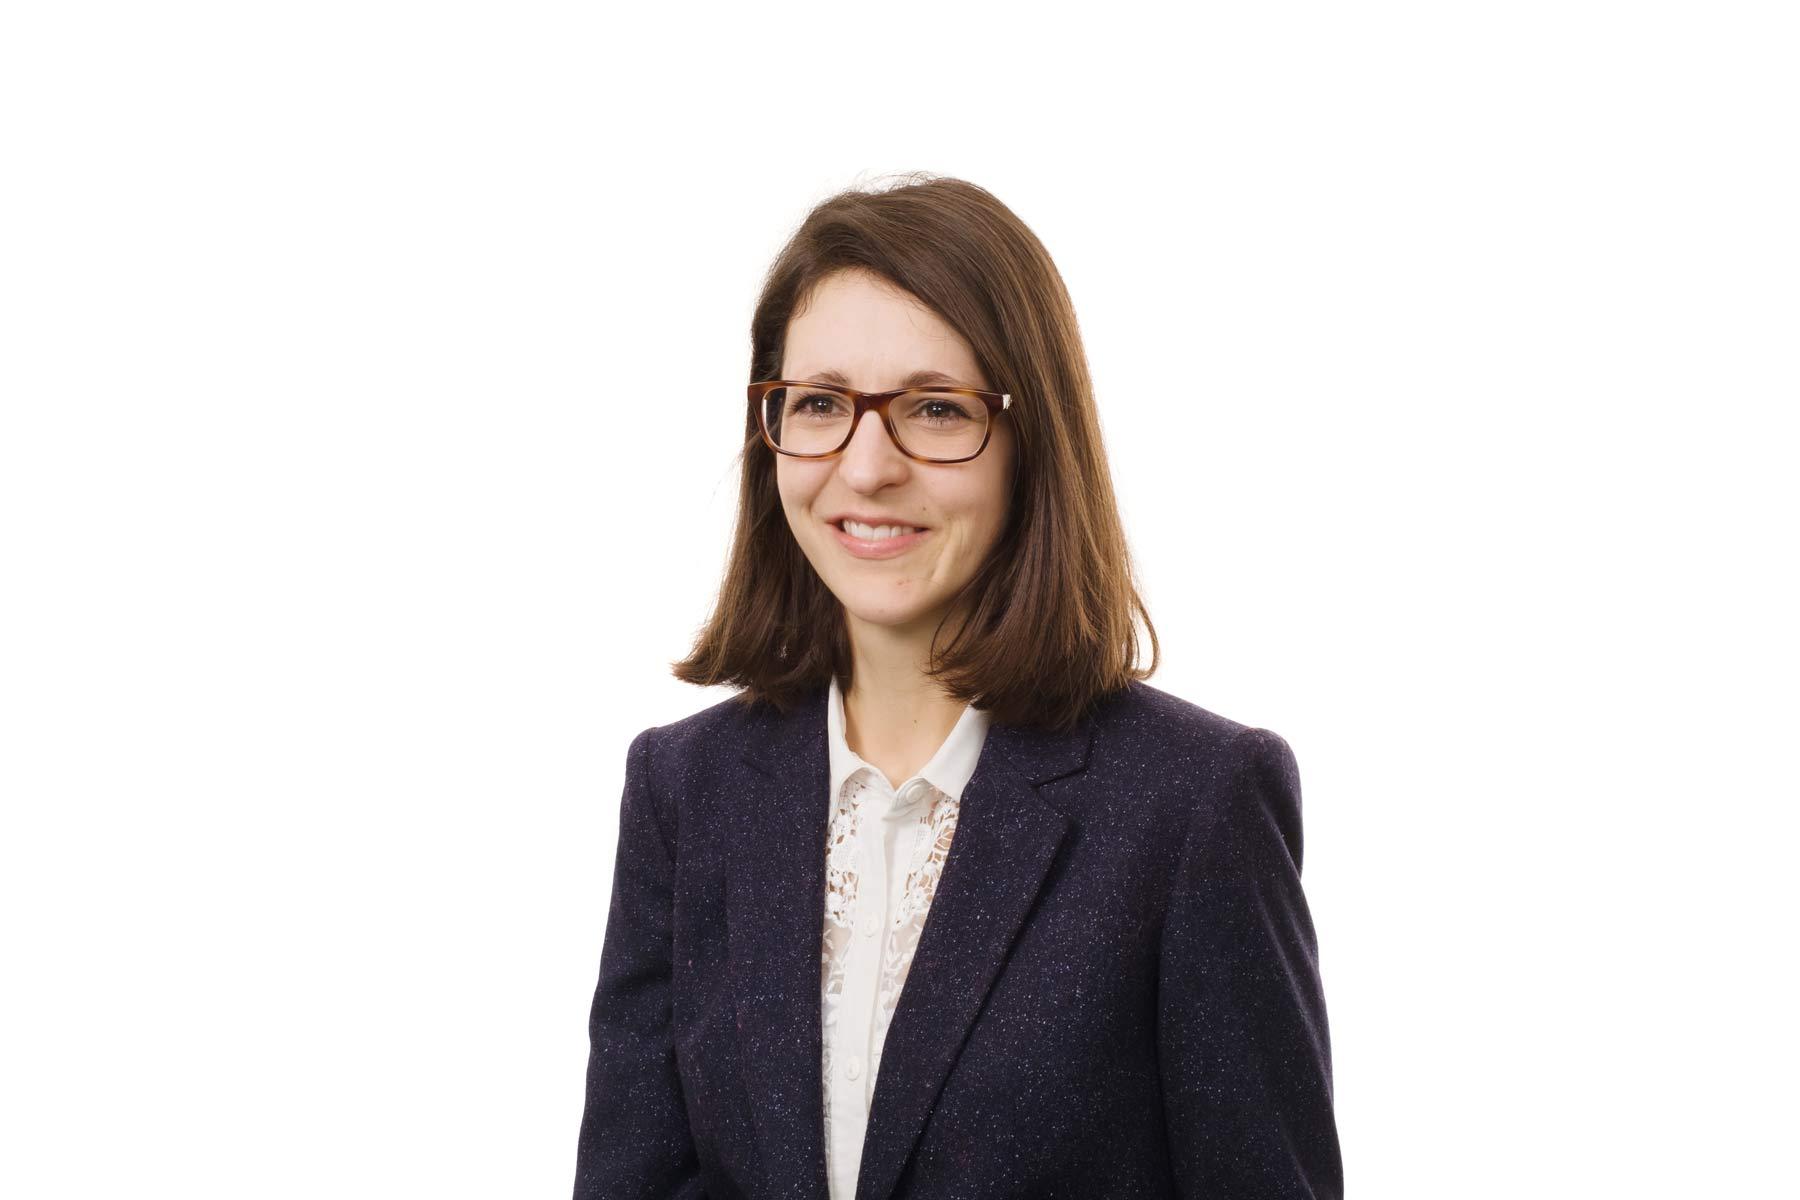 Claire Molyneux